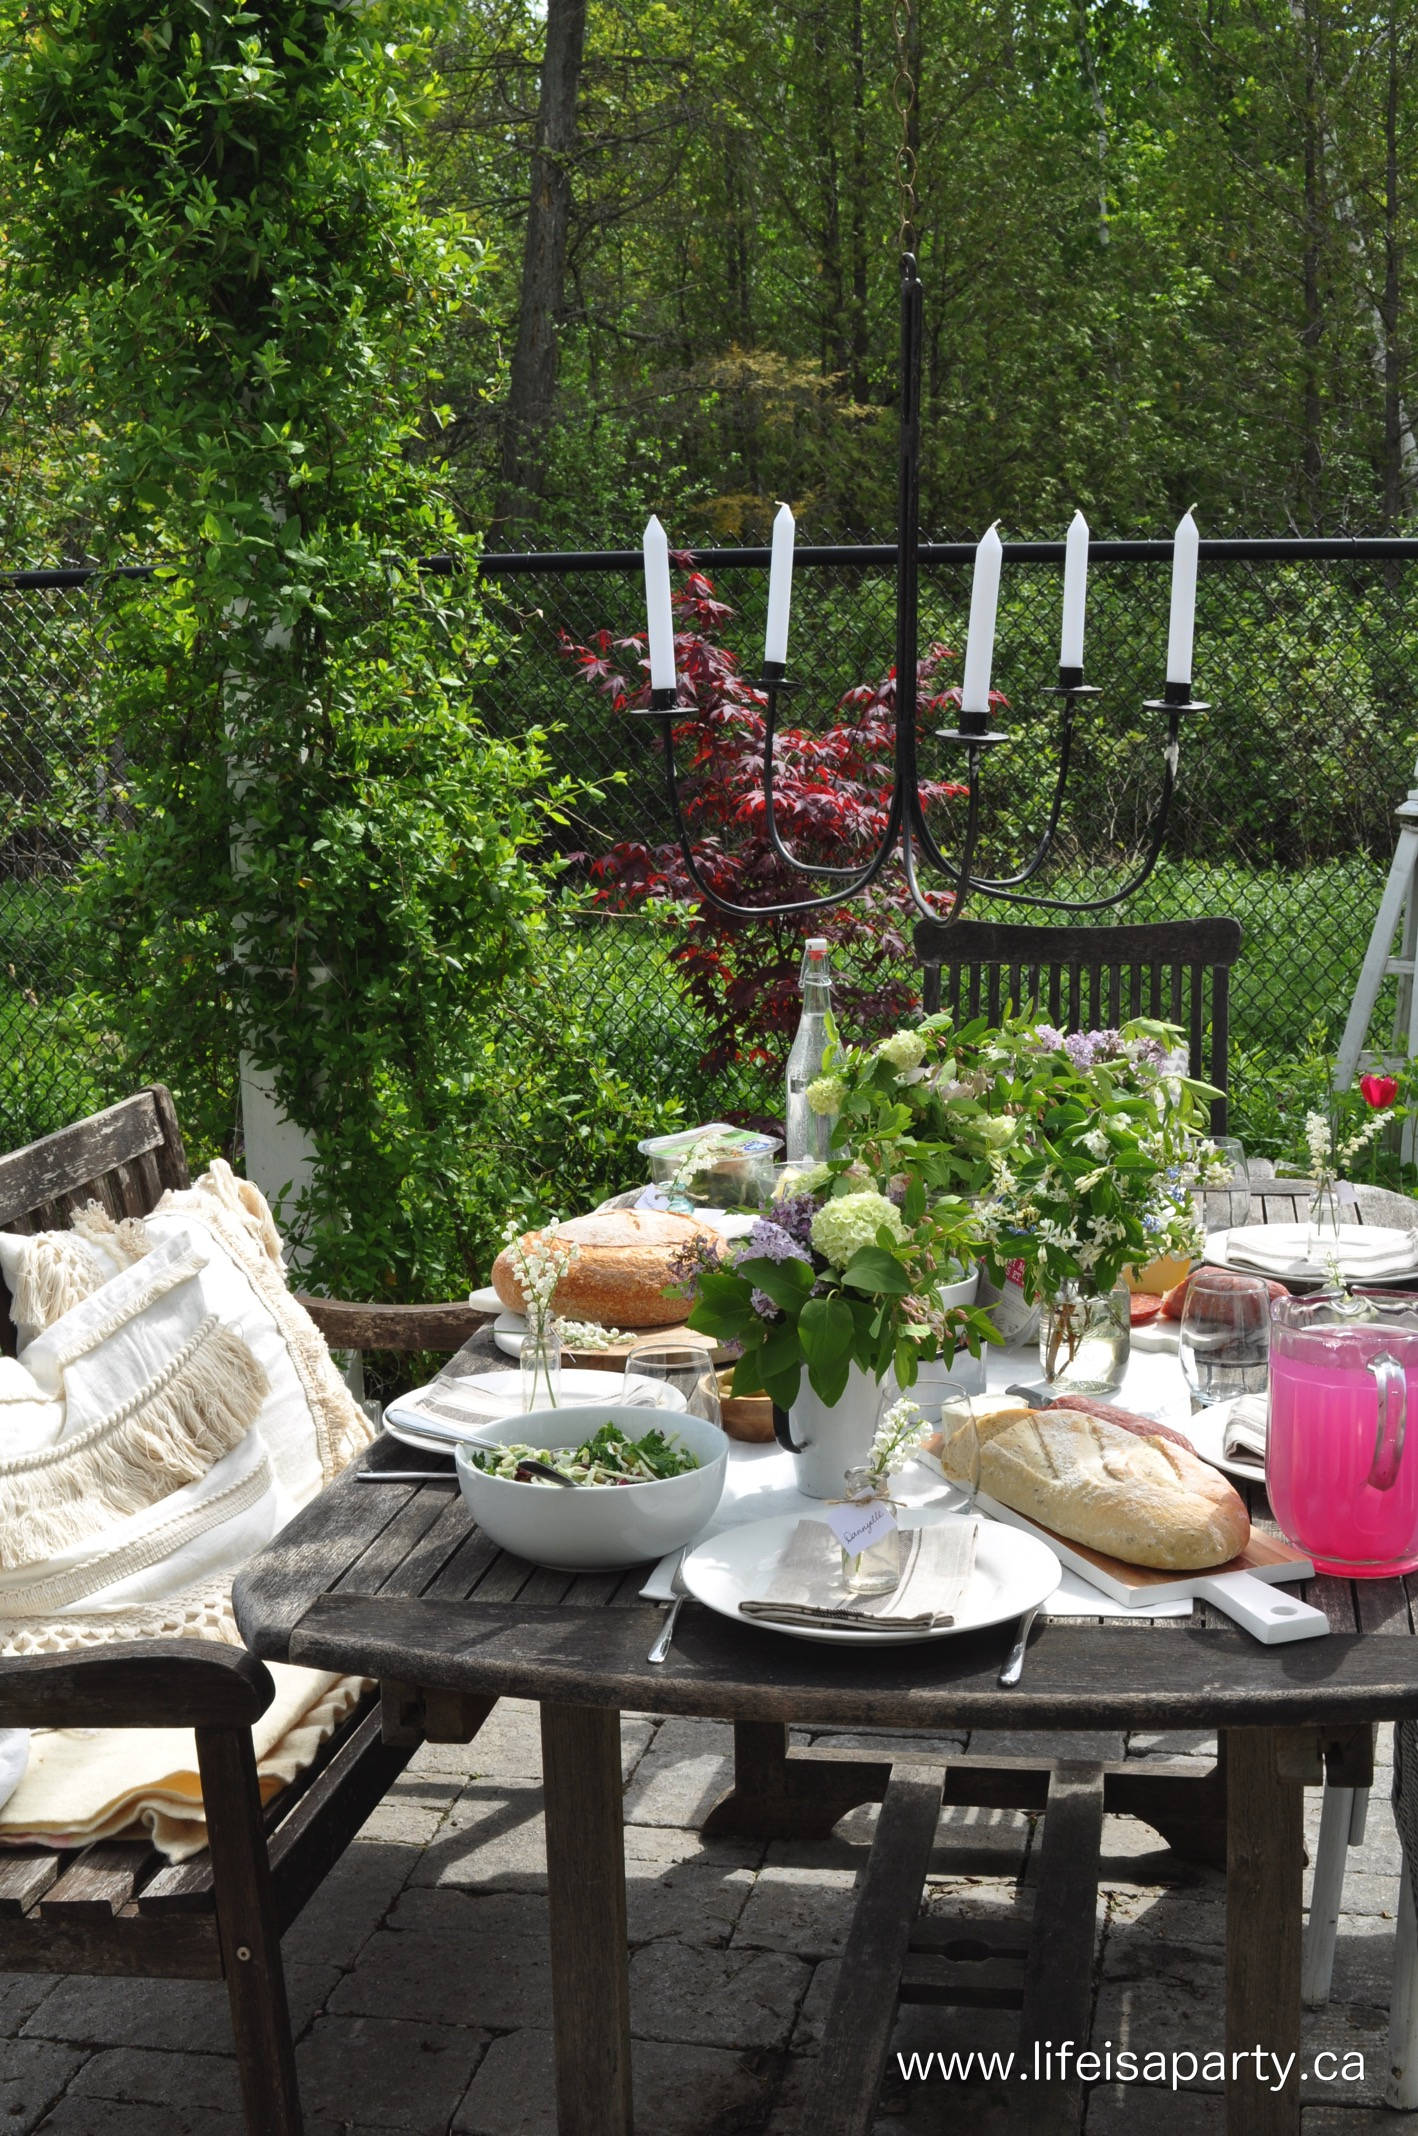 21.SIMPHOME.COM summer backyard picnic